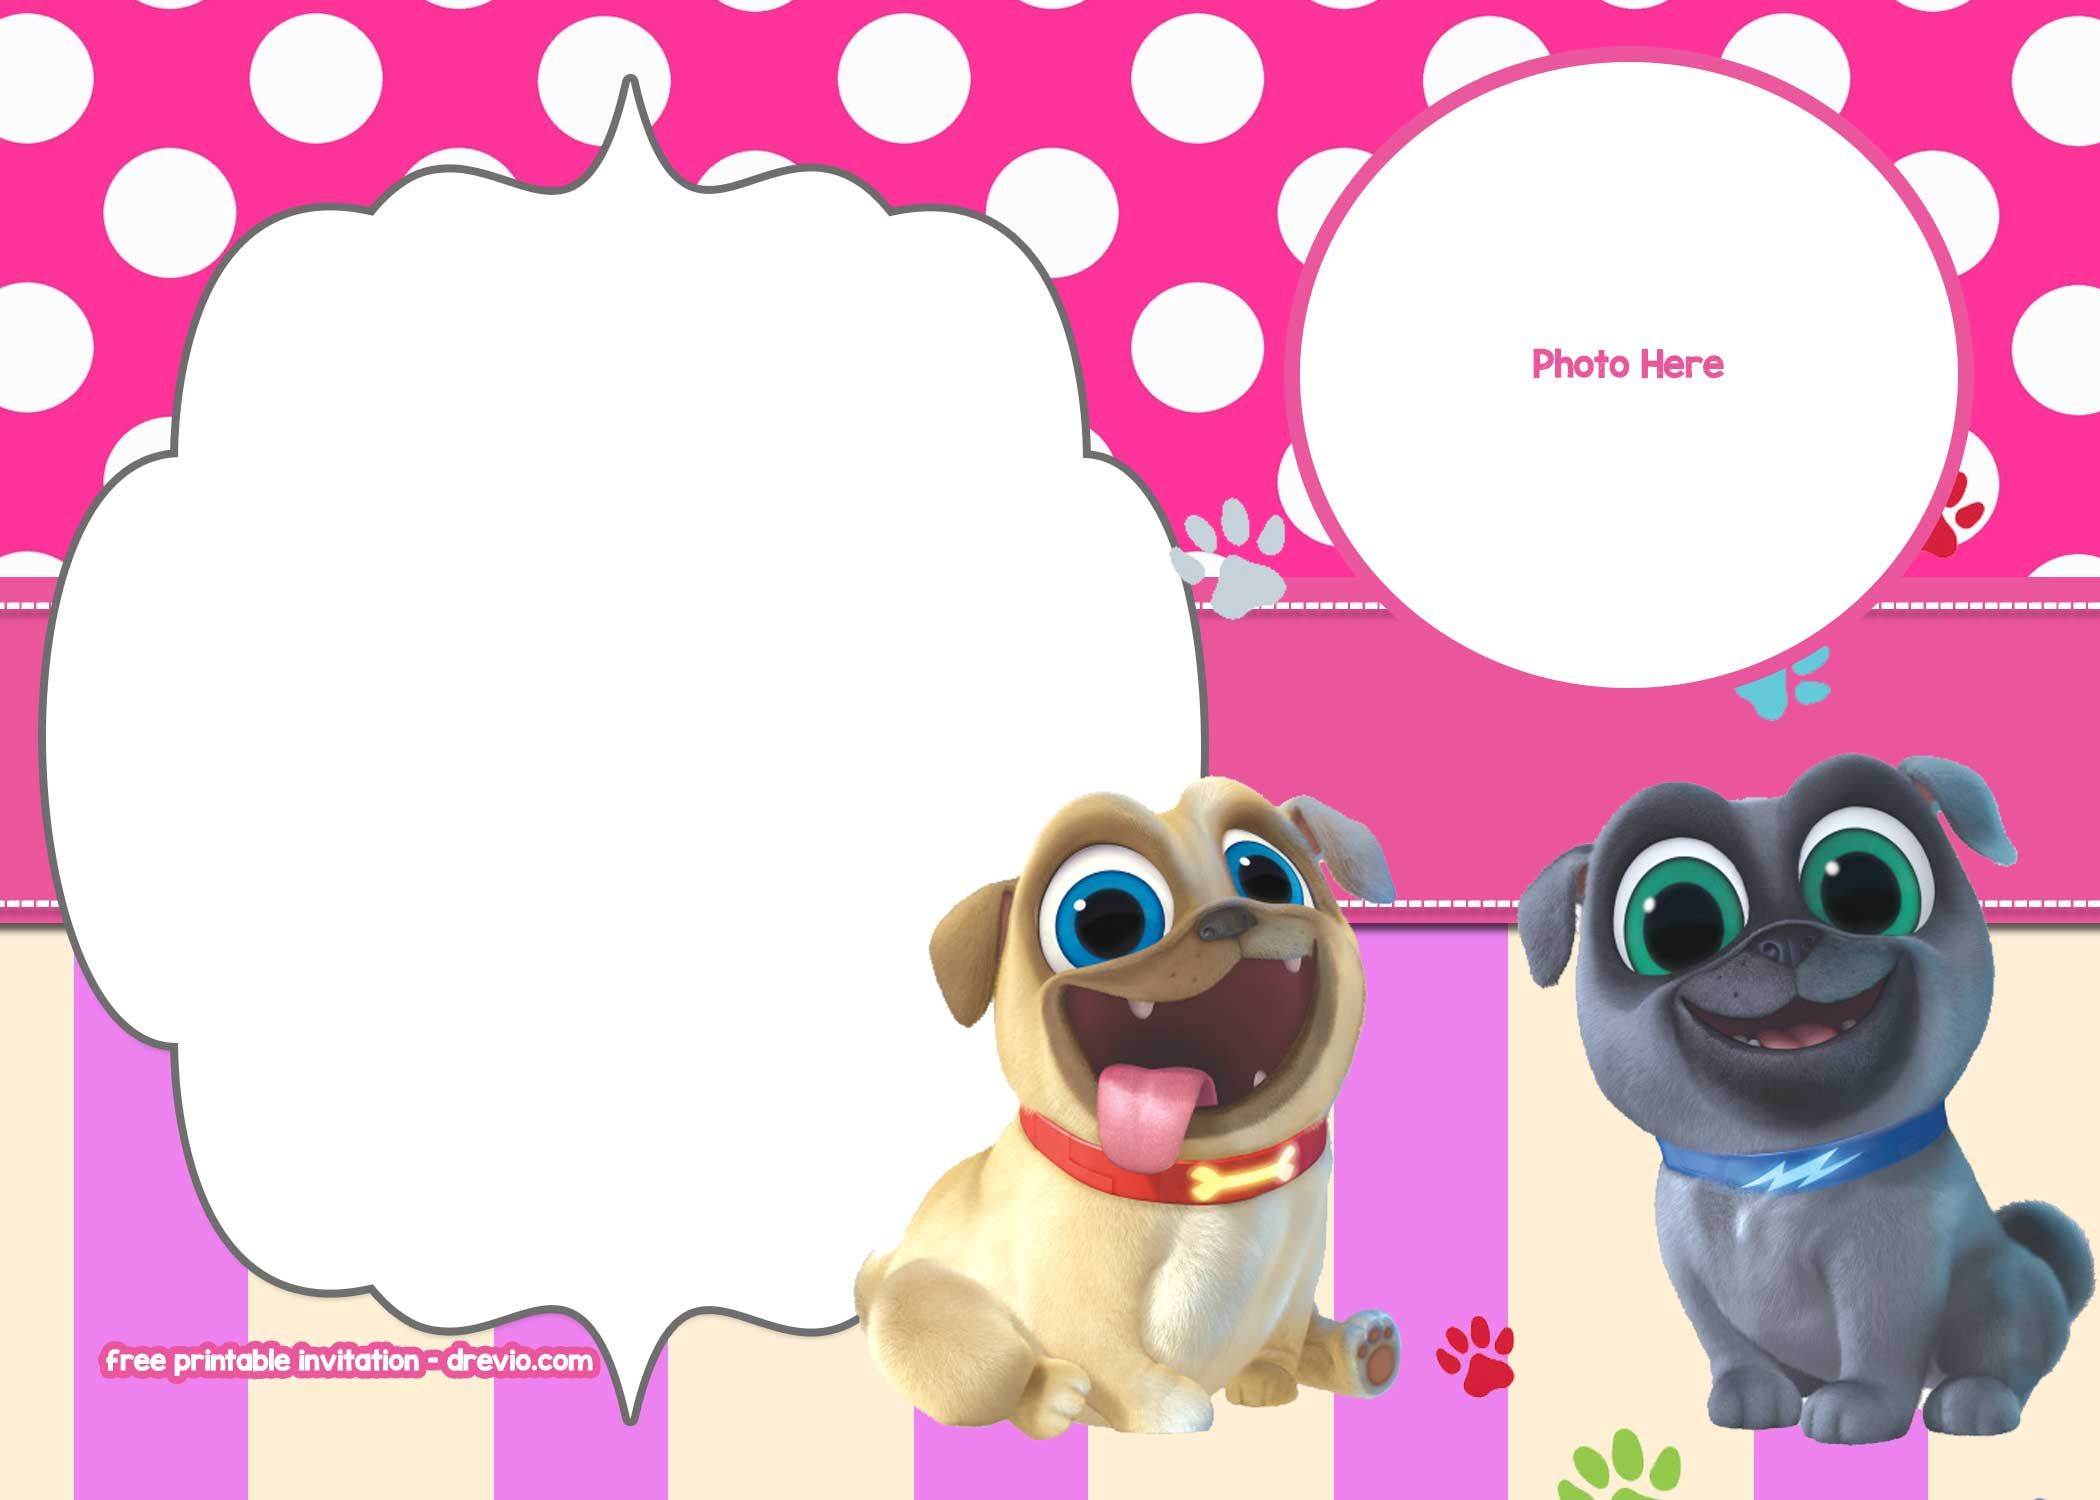 Puppy Dog Pals Invitation Templates